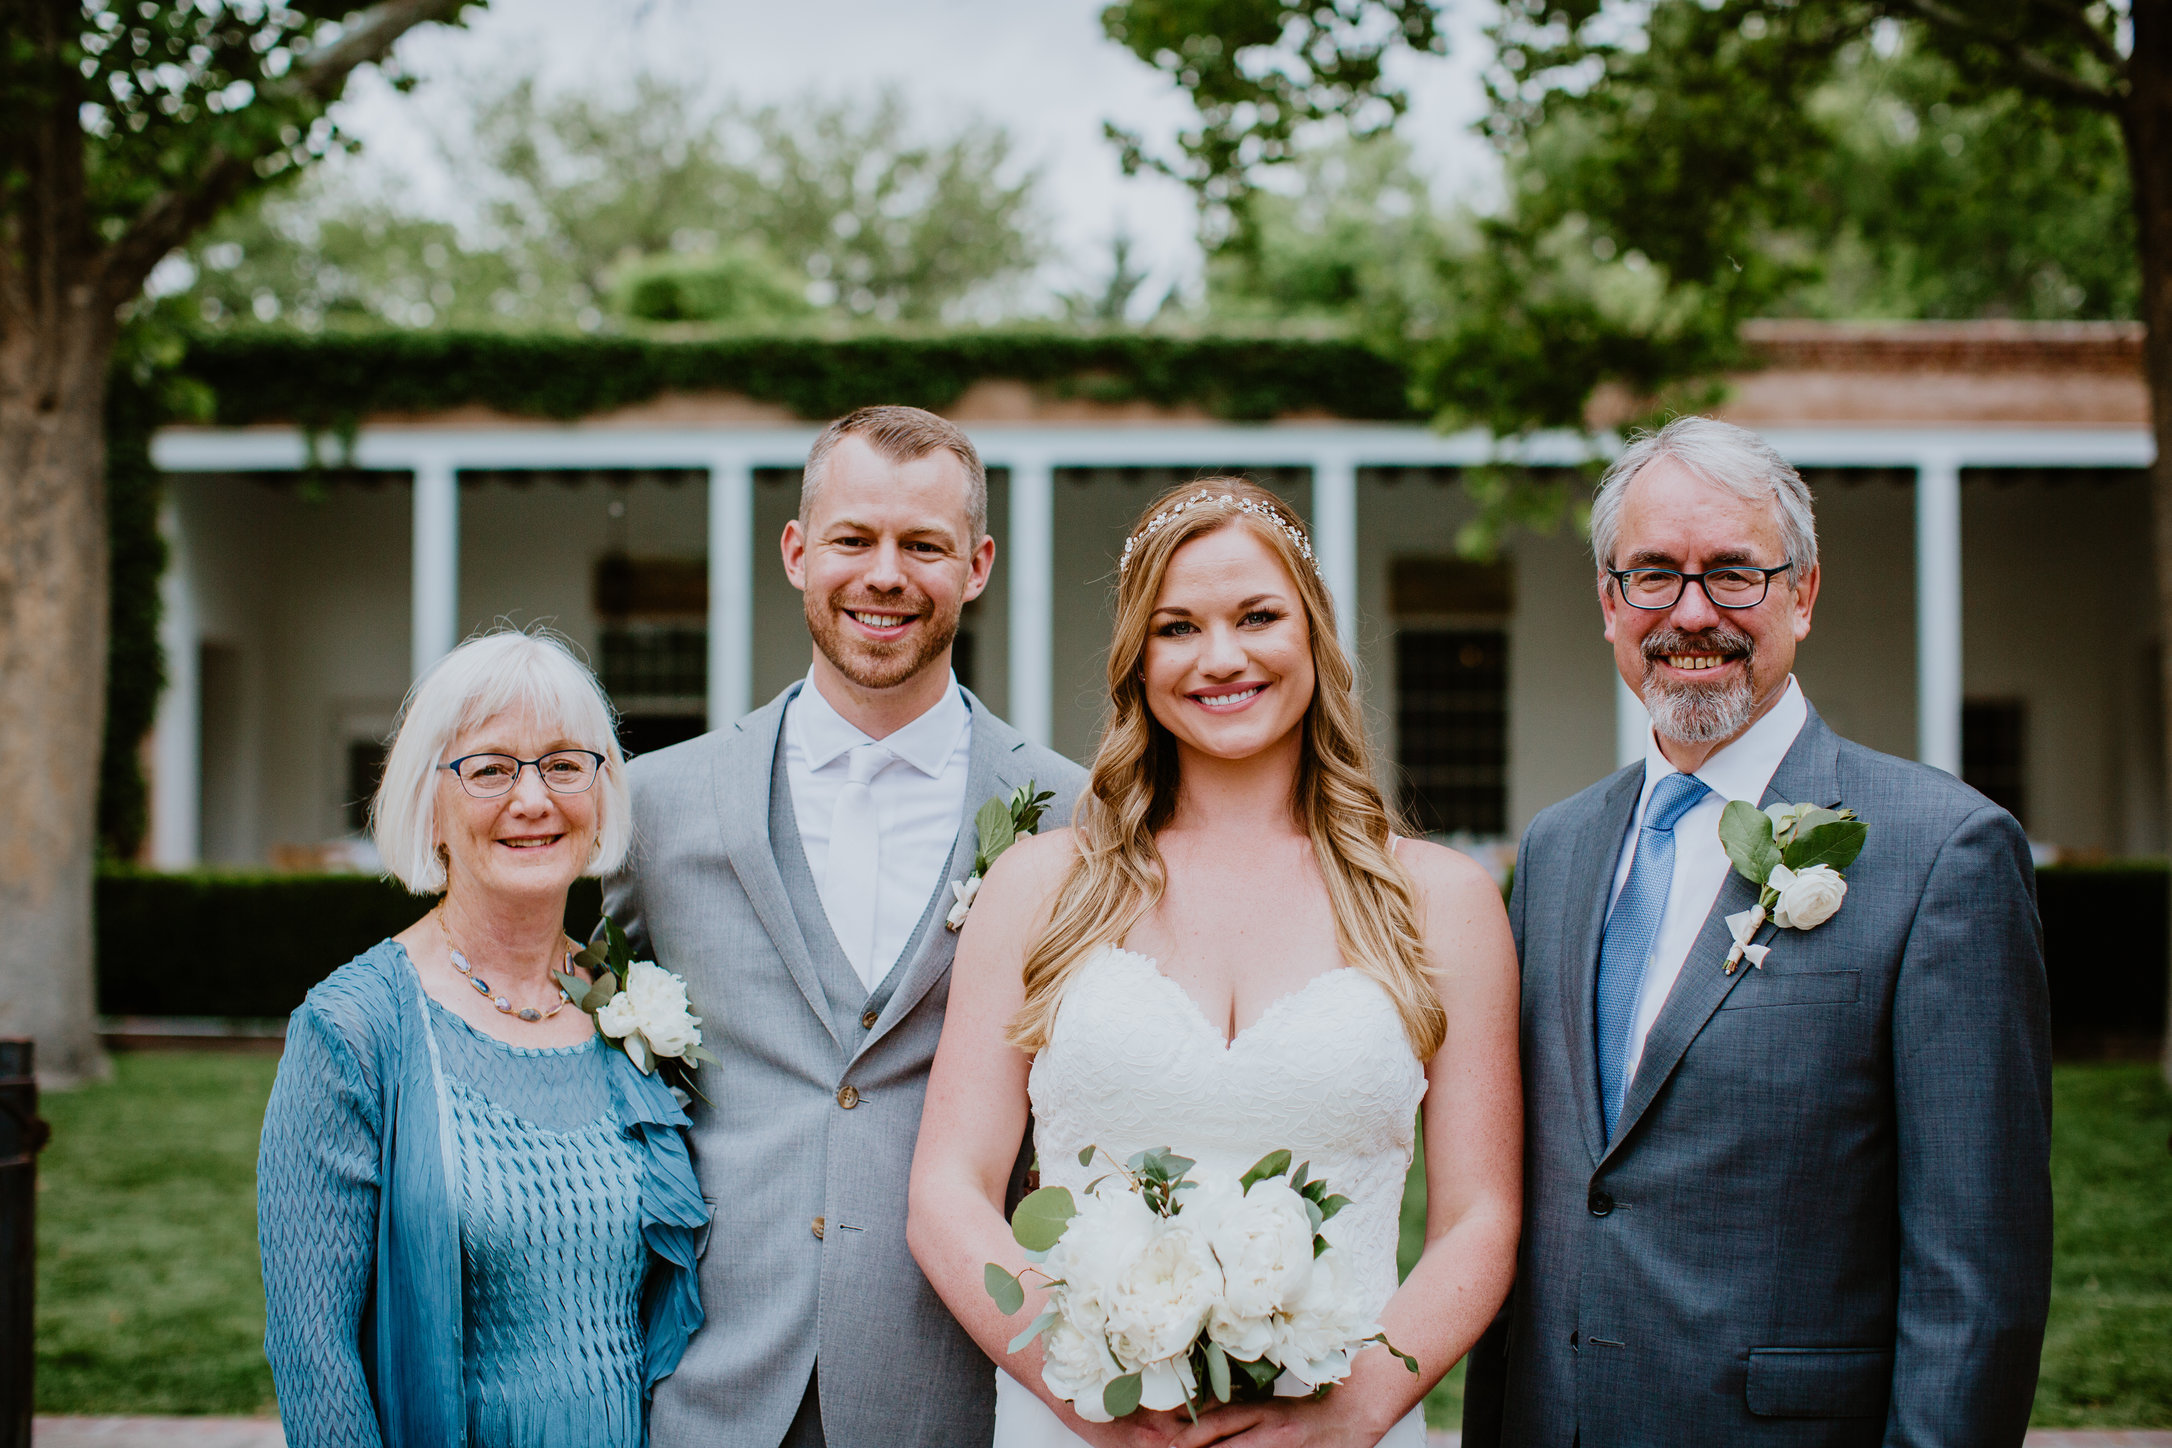 DandA-wedding-487.jpg